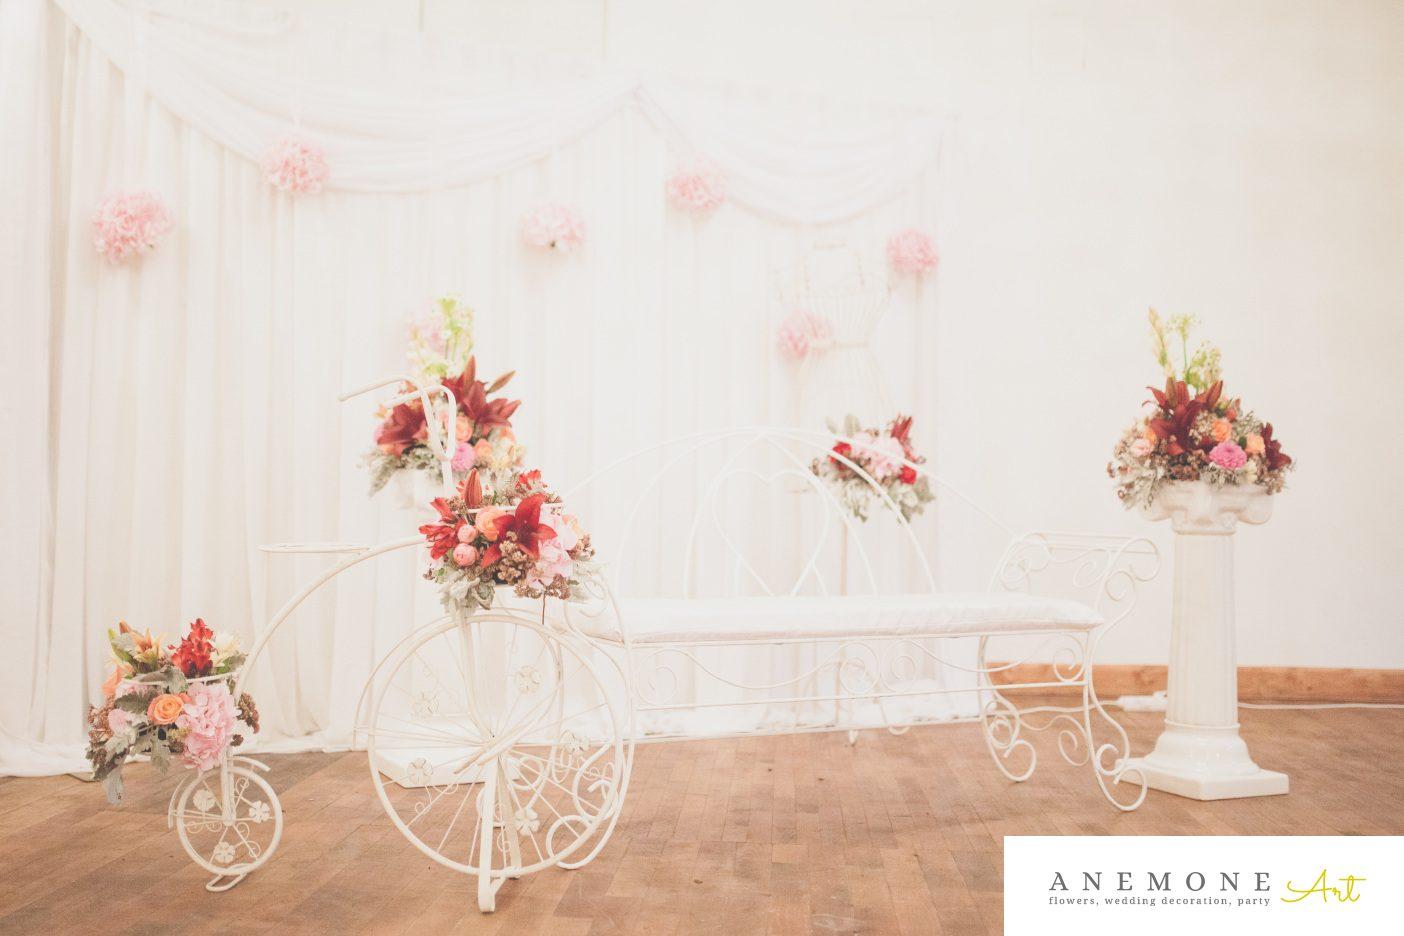 Poza, foto cu Flori de nunta banca, bicicleta, bordo, decor colt photo, rosu, stalp ceramica in Arad, Timisoara, Oradea (wedding flowers, bouquets) nunta Arad, Timisoara, Oradea